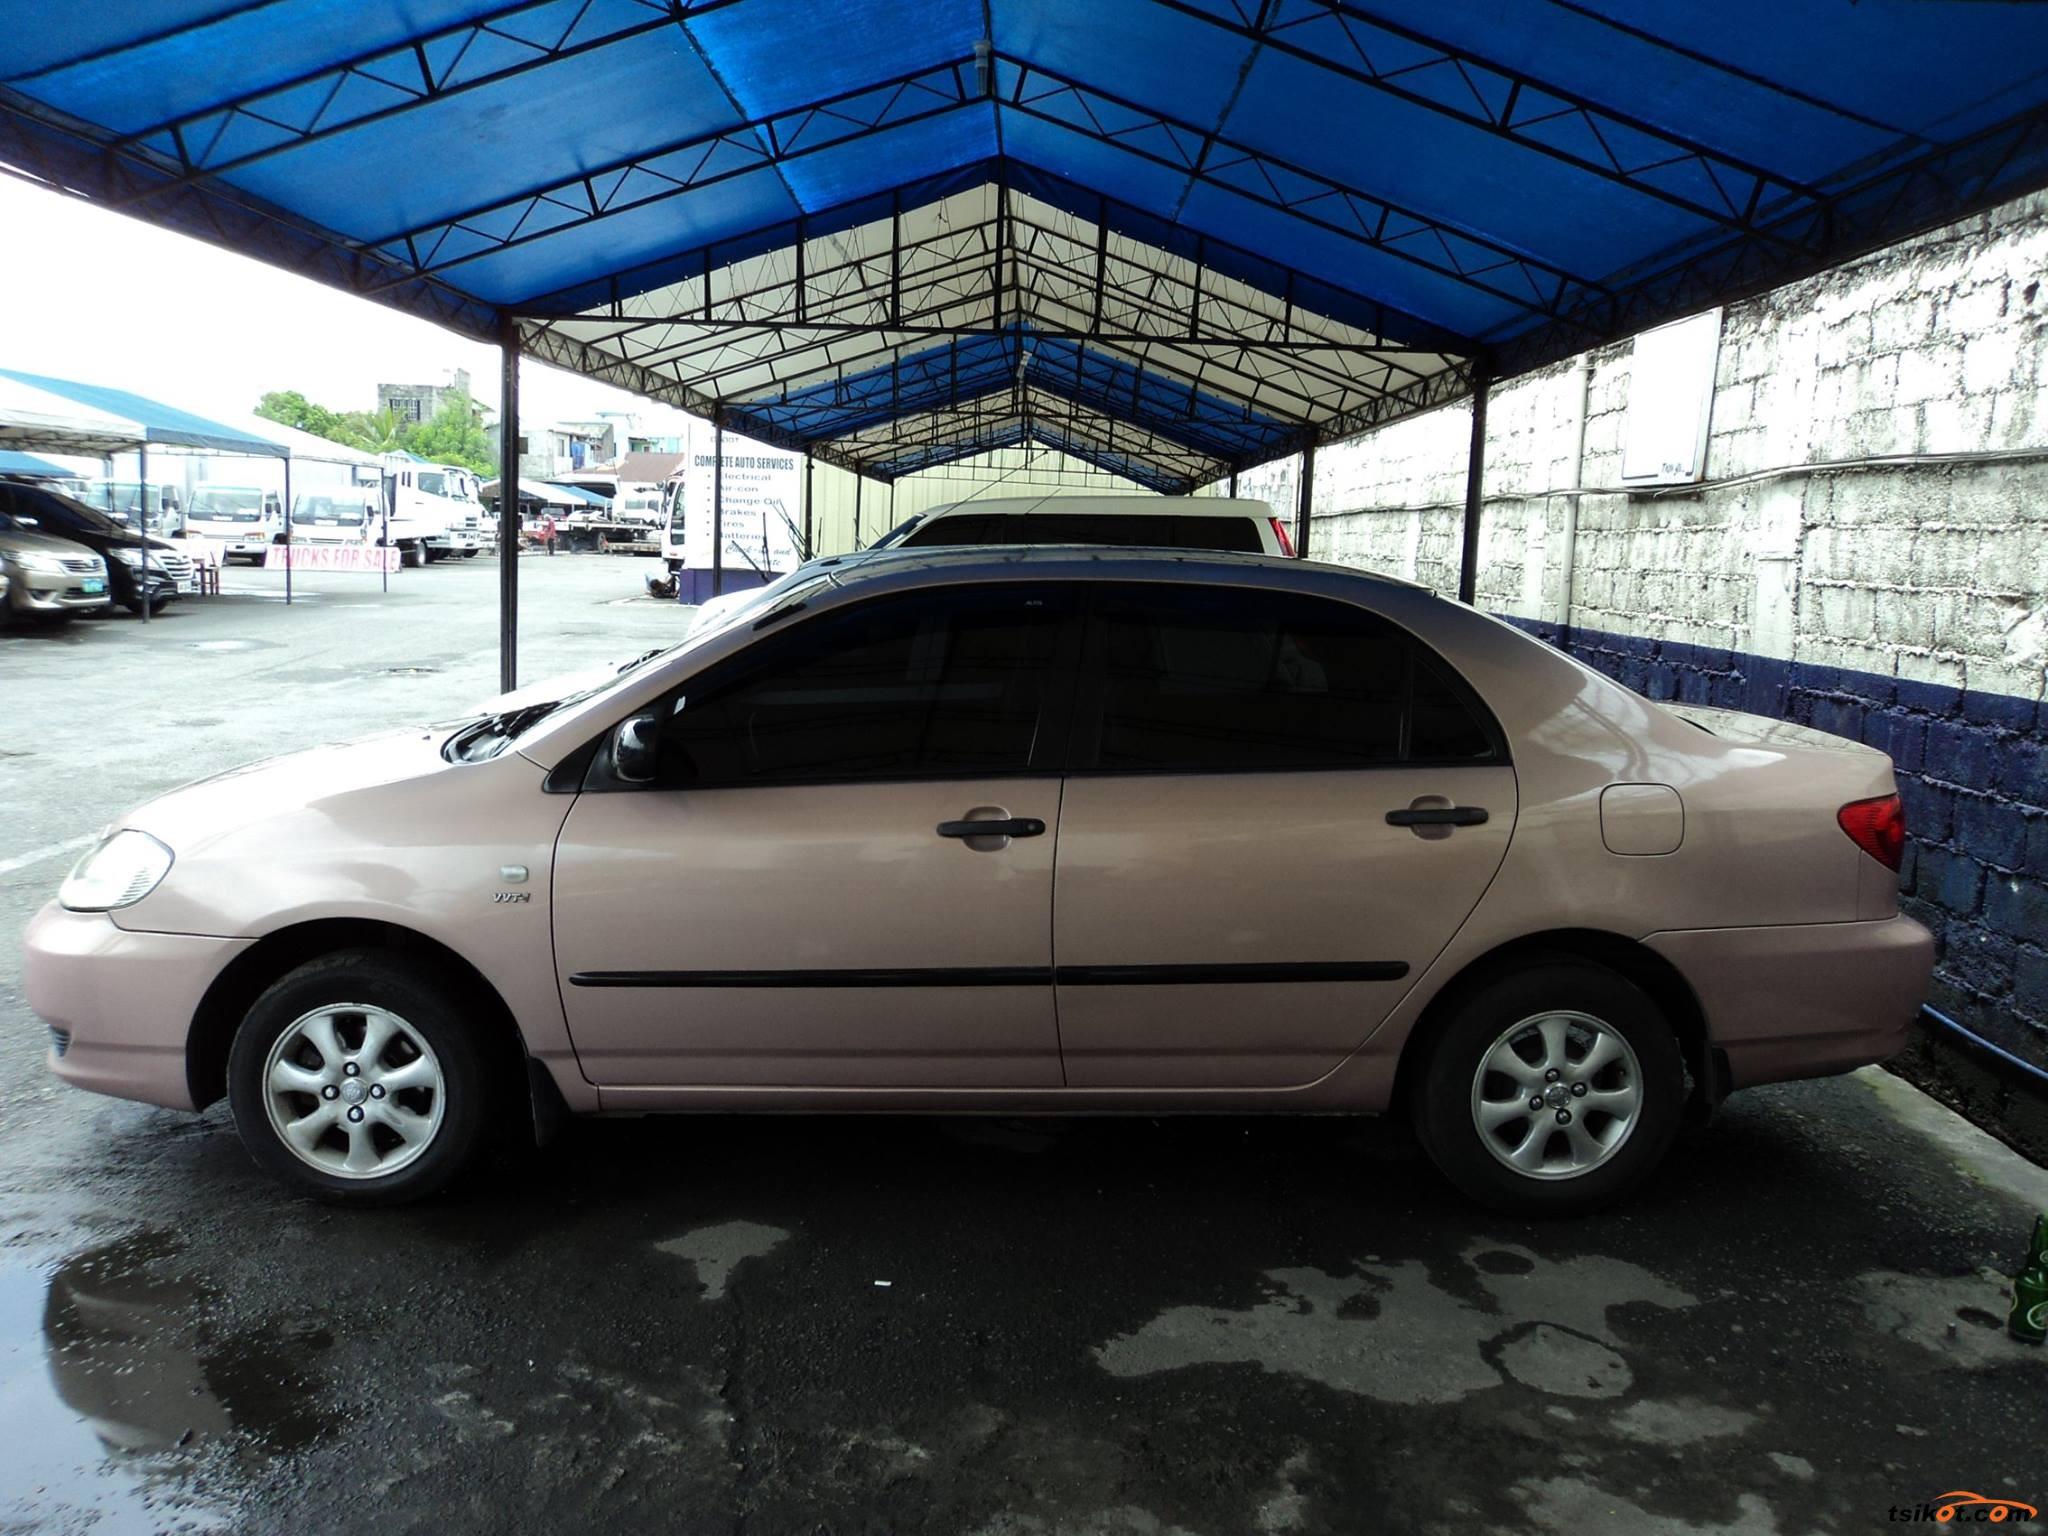 Toyota Corolla 2002 - 10